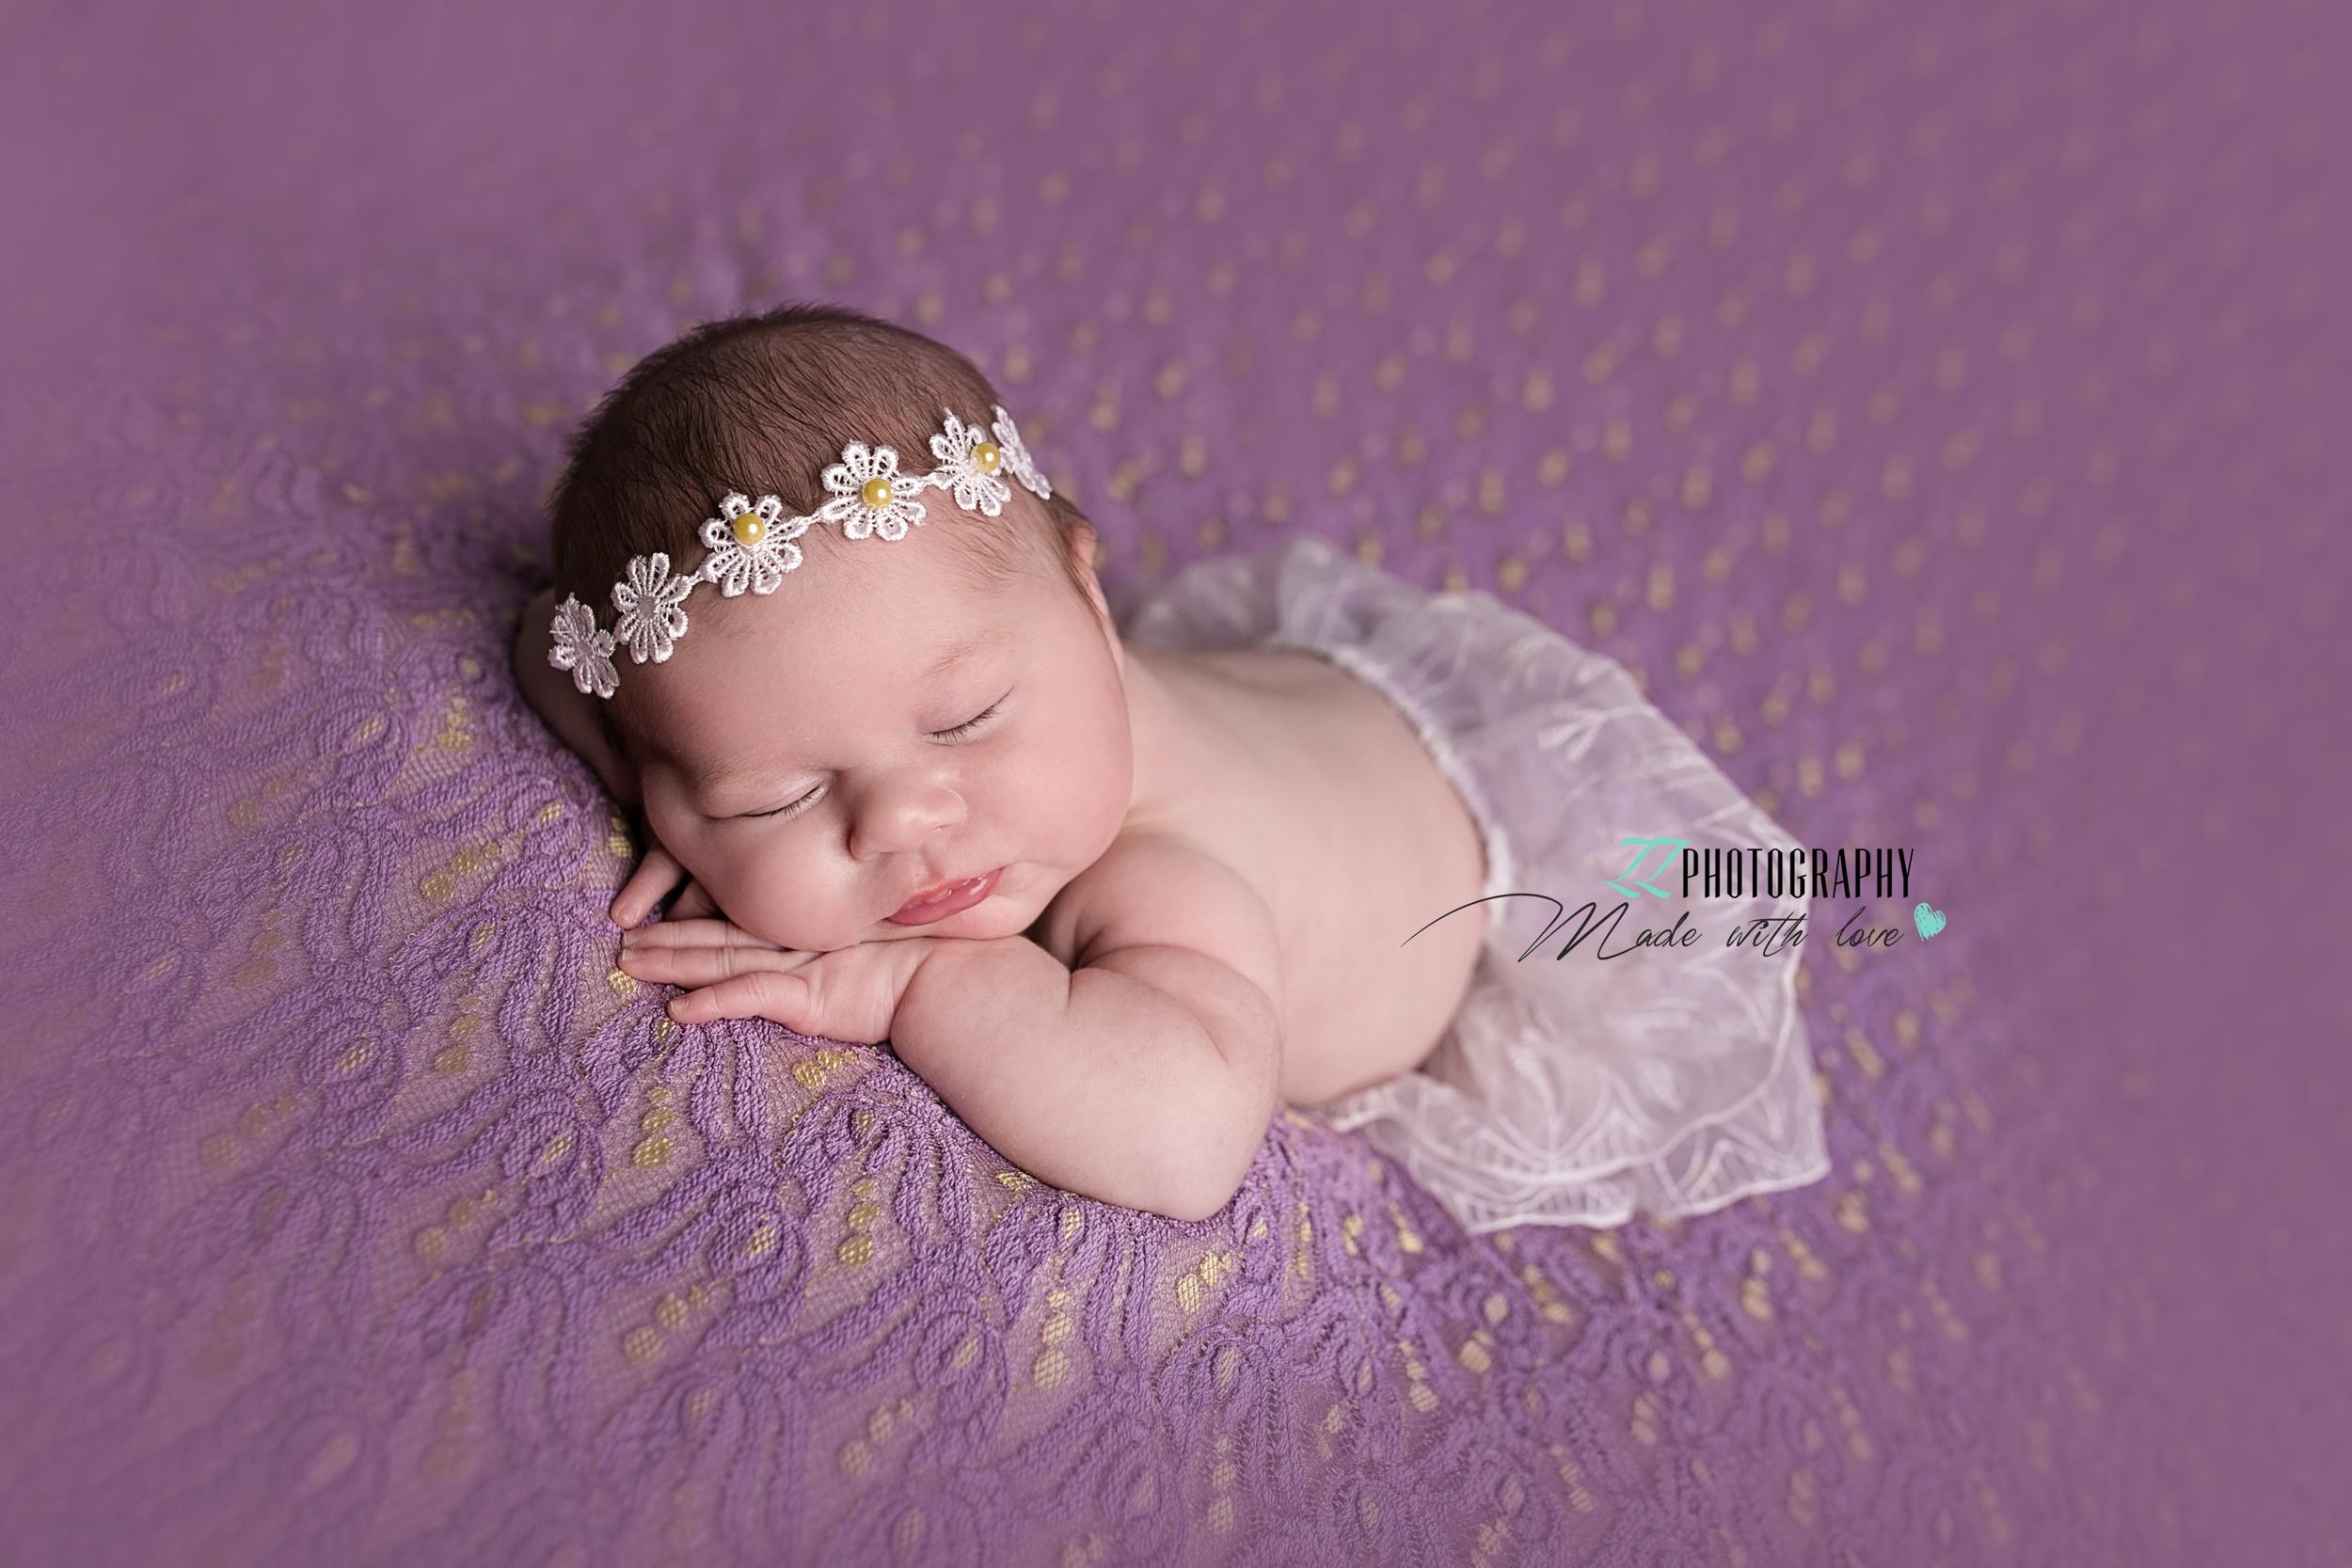 pretty newborn baby photograph